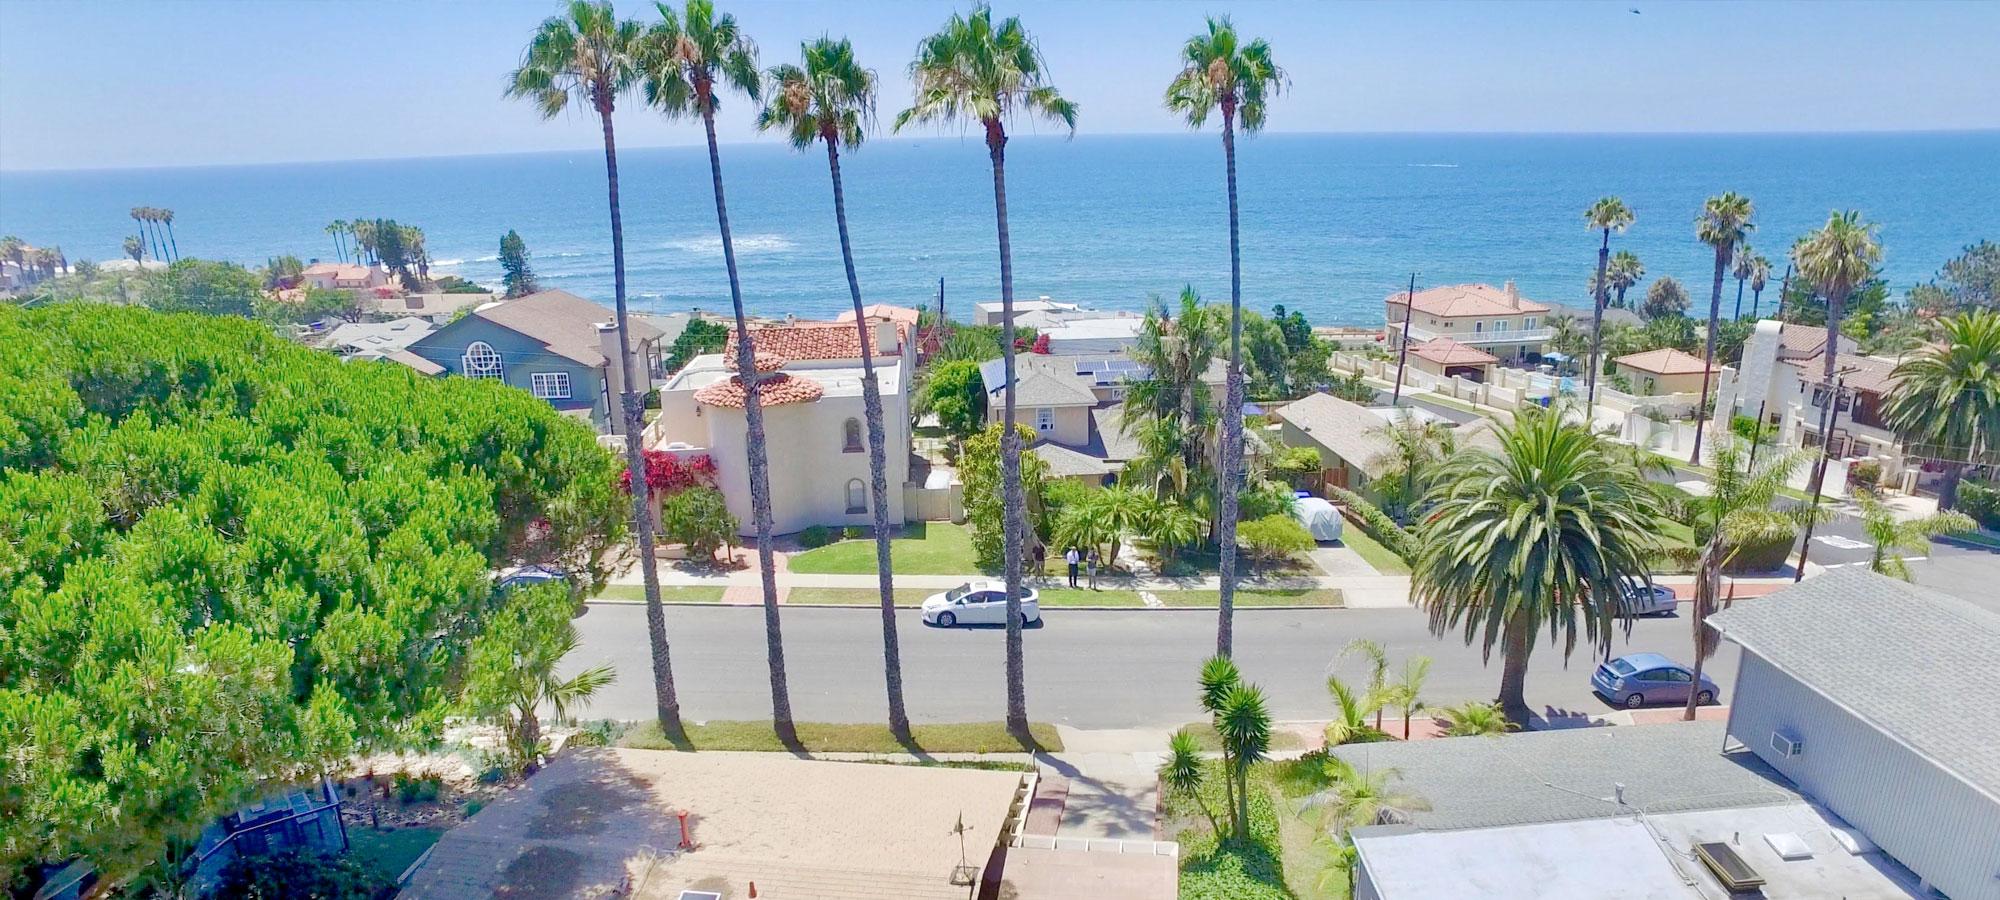 1041 Devonshire Dr. San Diego, CA 92107